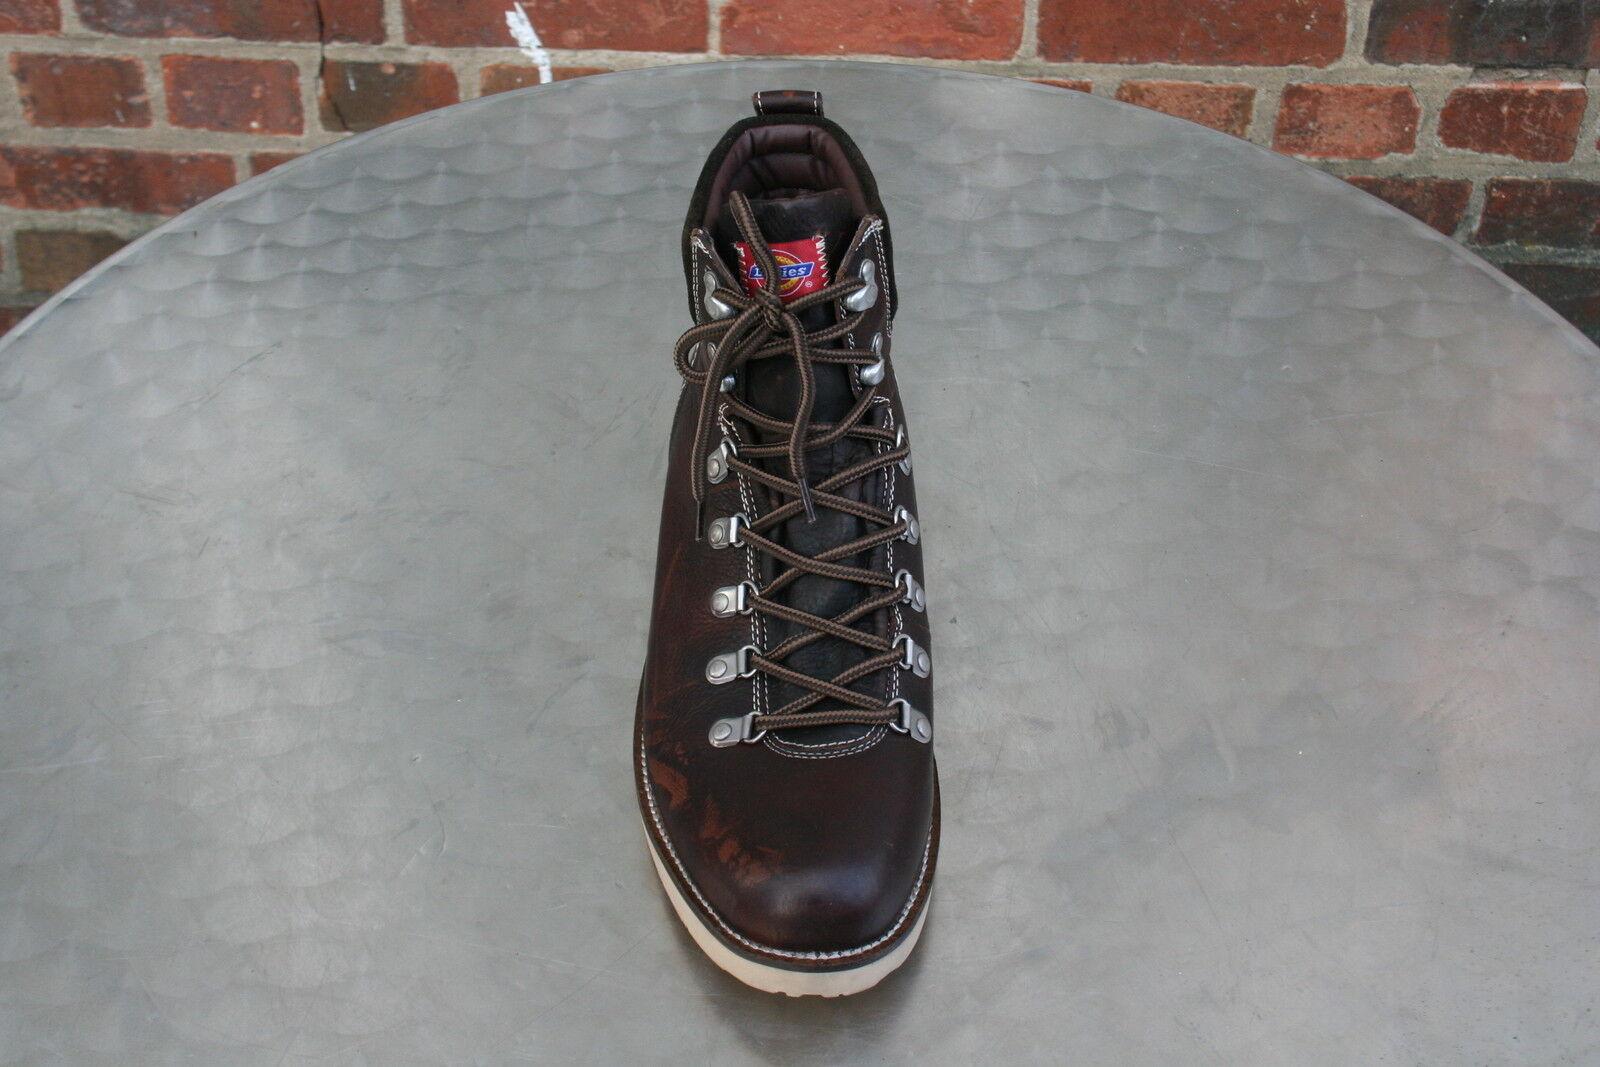 new product 91823 ce071 ... Dickies Stiefel halbhoch dunkel braun Gr.46 Leder Man Boots Man  -ungetragen- 3c68e5 ...